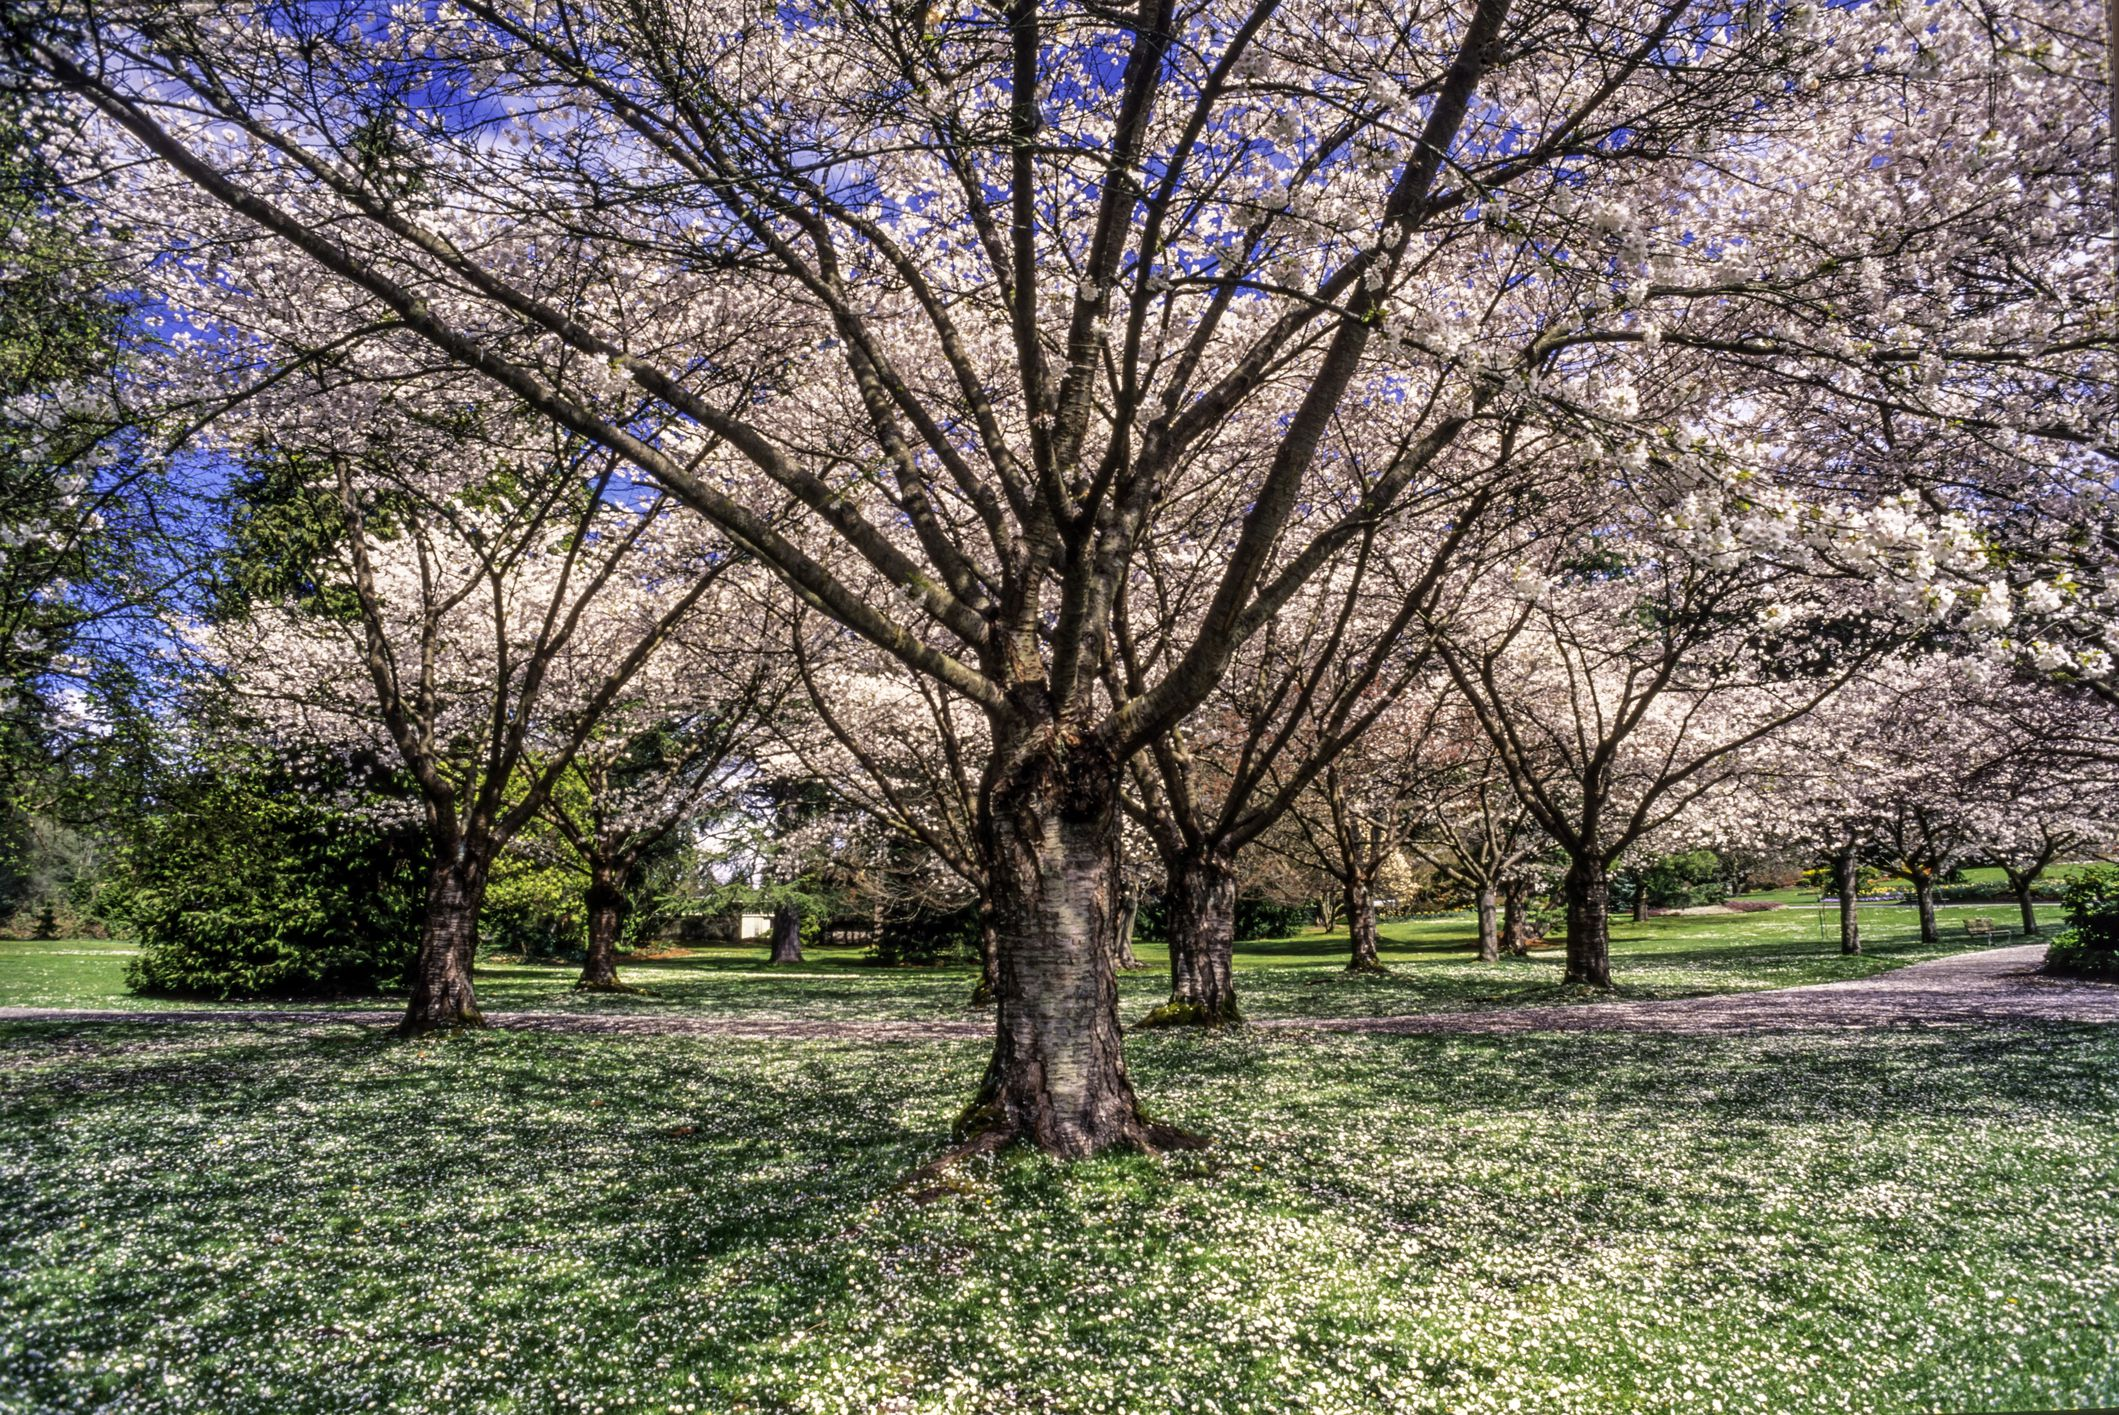 Cerezo en flor, Stanley Park, Vancouver, Columbia Británica, Canadá